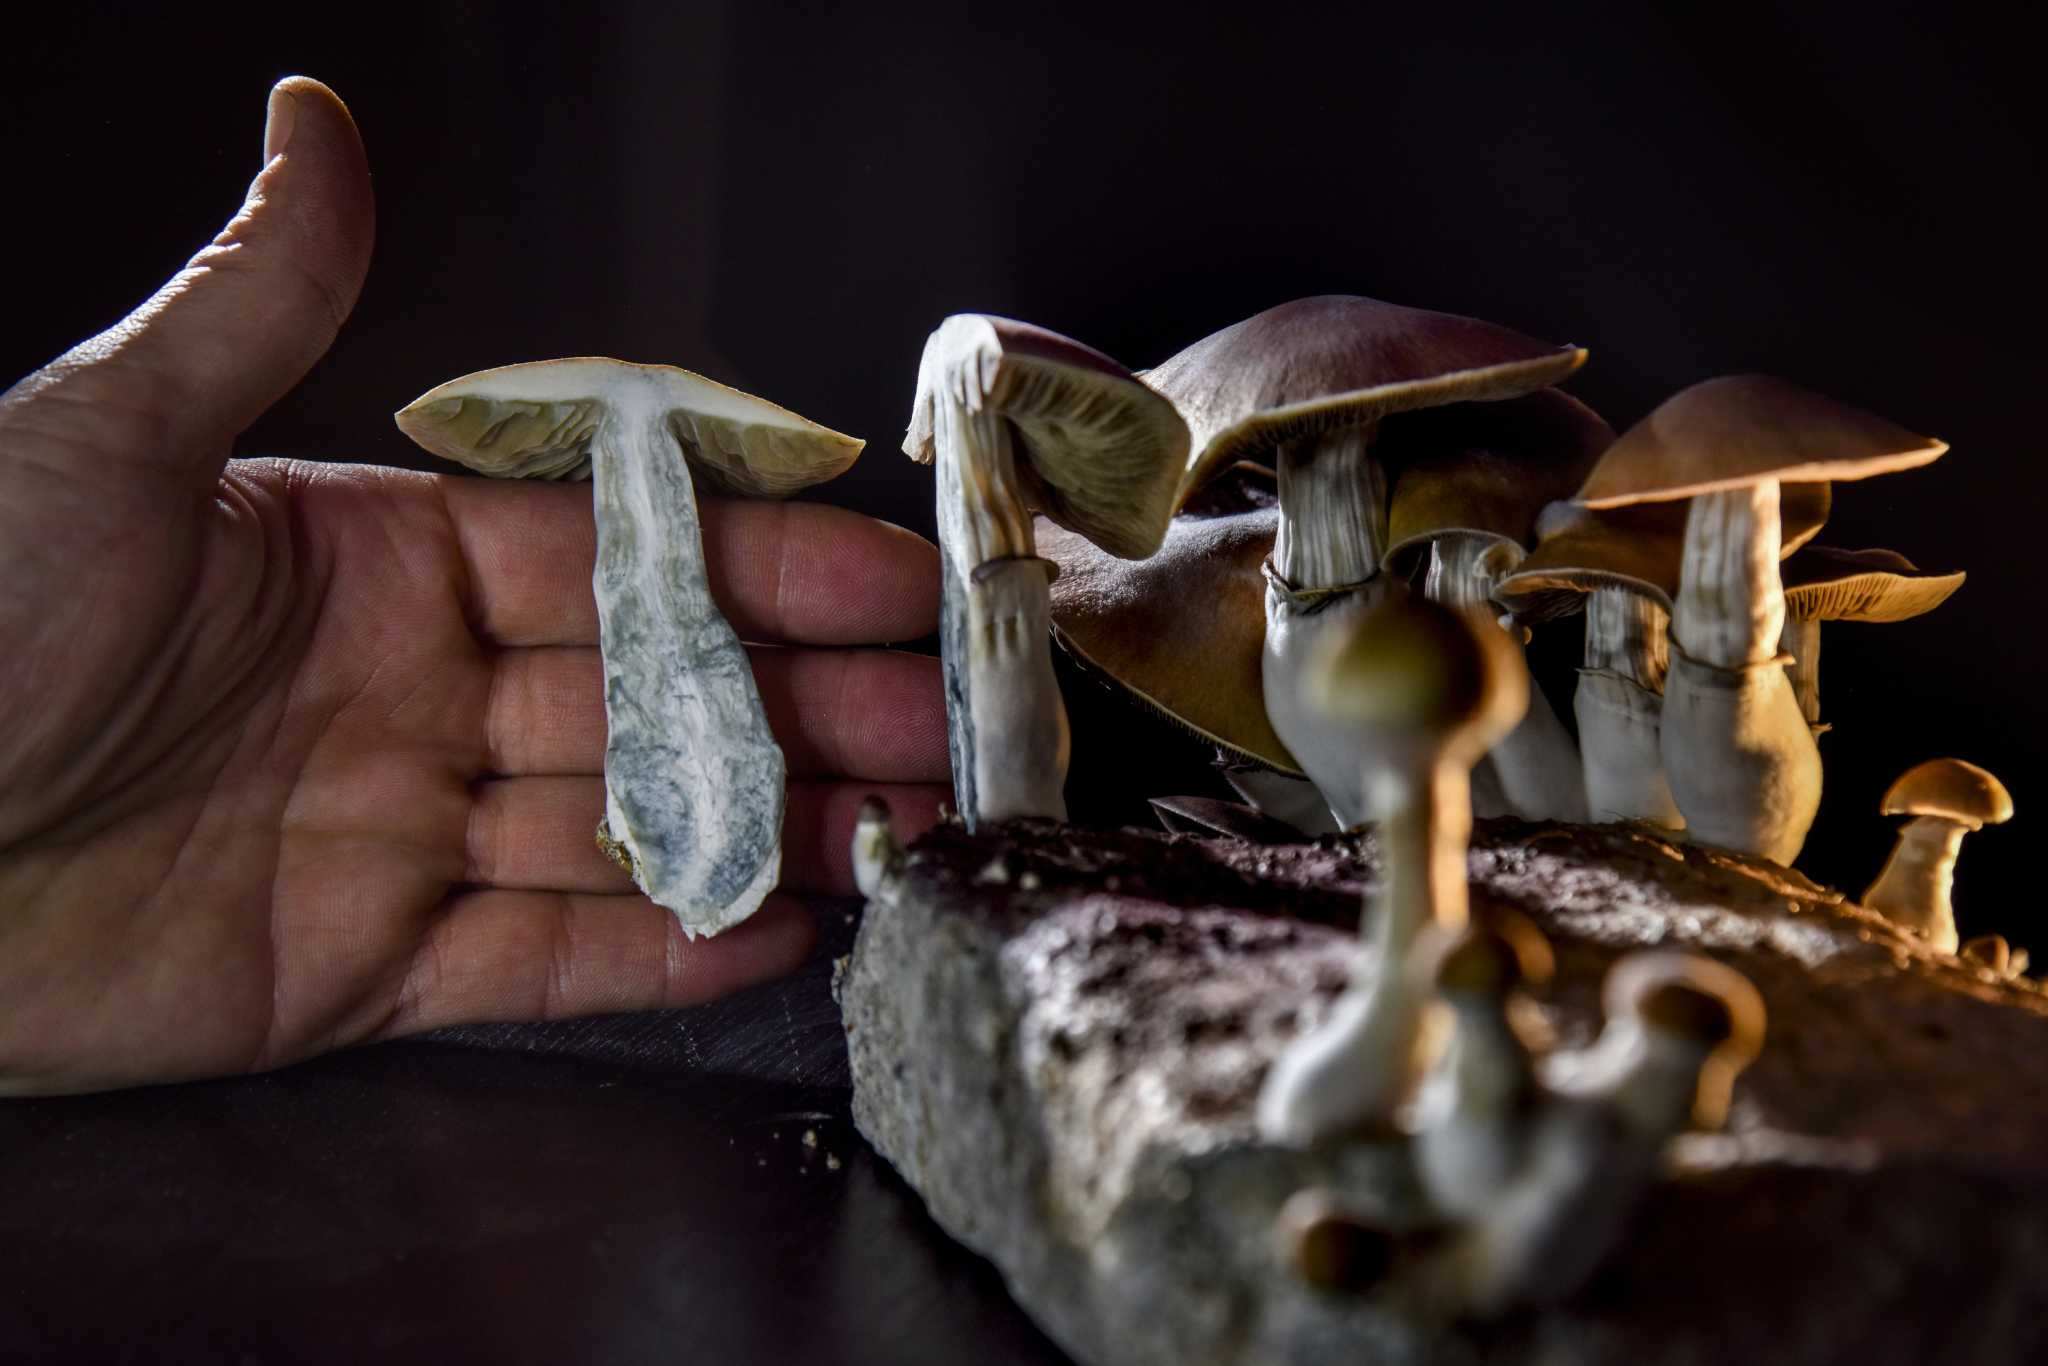 D.C. residents to vote on decriminalization of 'magic mushrooms' on November ballot